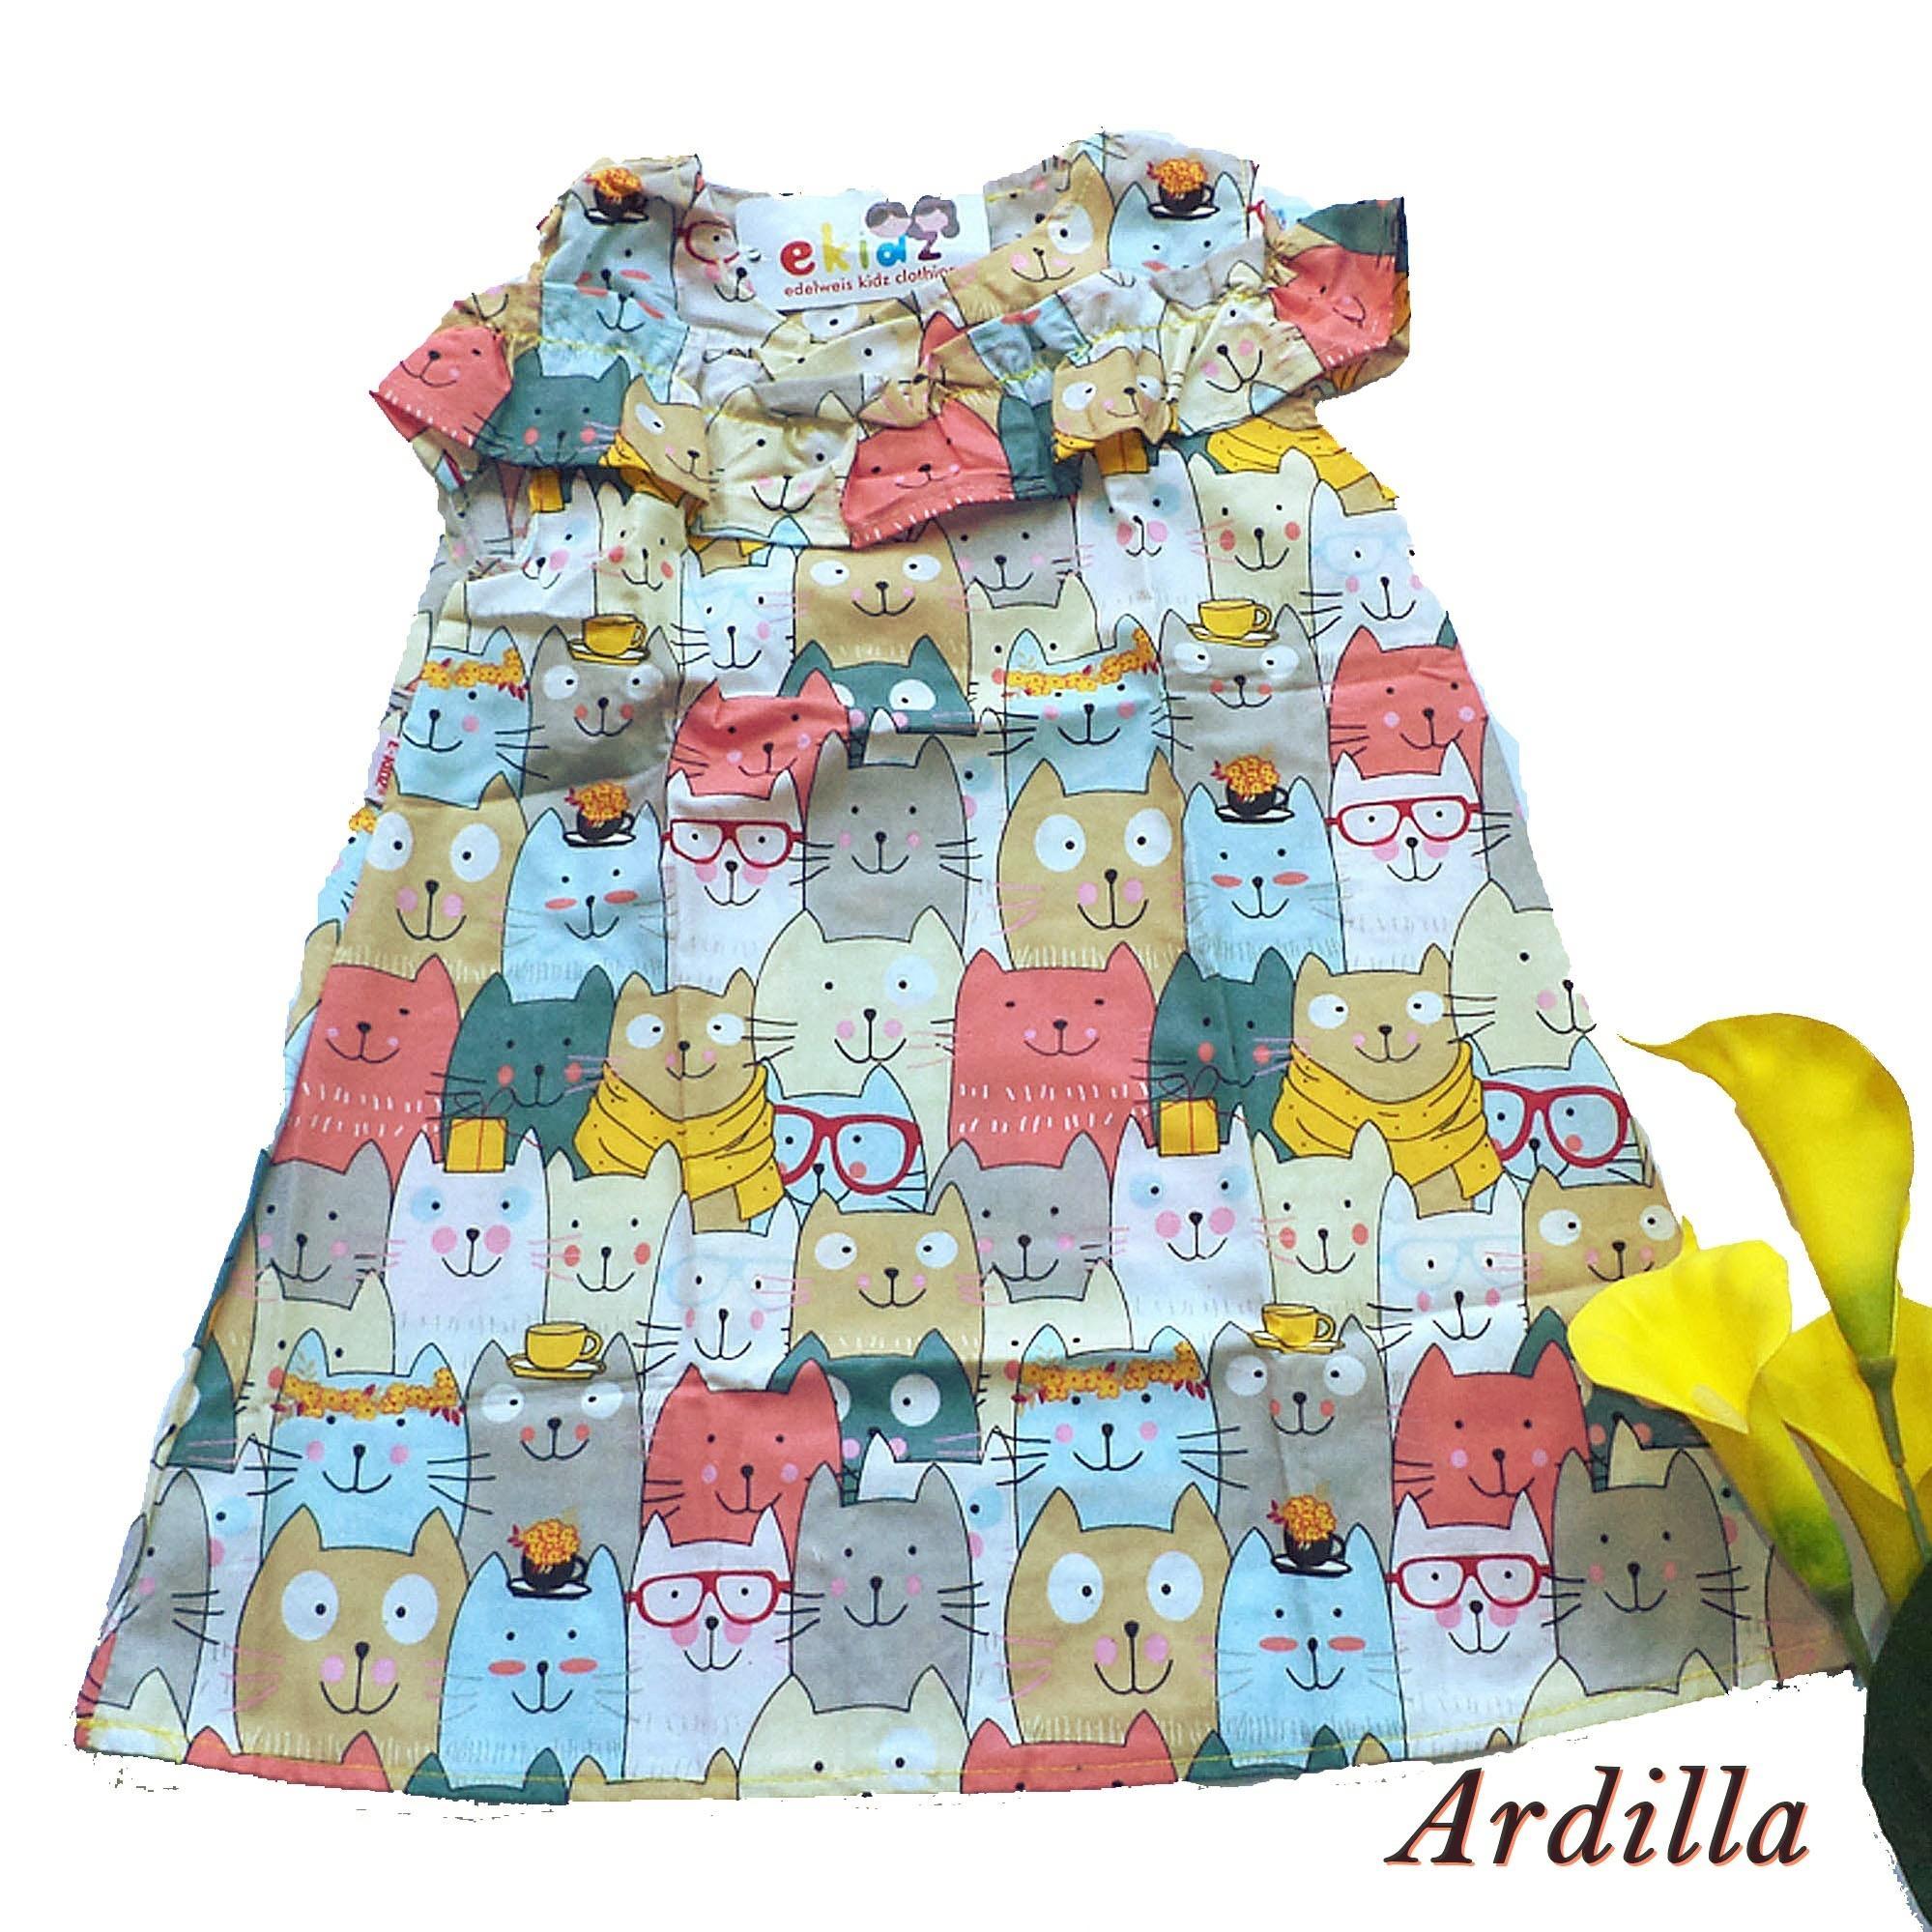 Grosir Baju Anak Ekidz Distributor Kaos Agen Dress Perempuan Motif Cat Ardilla By Pakaian